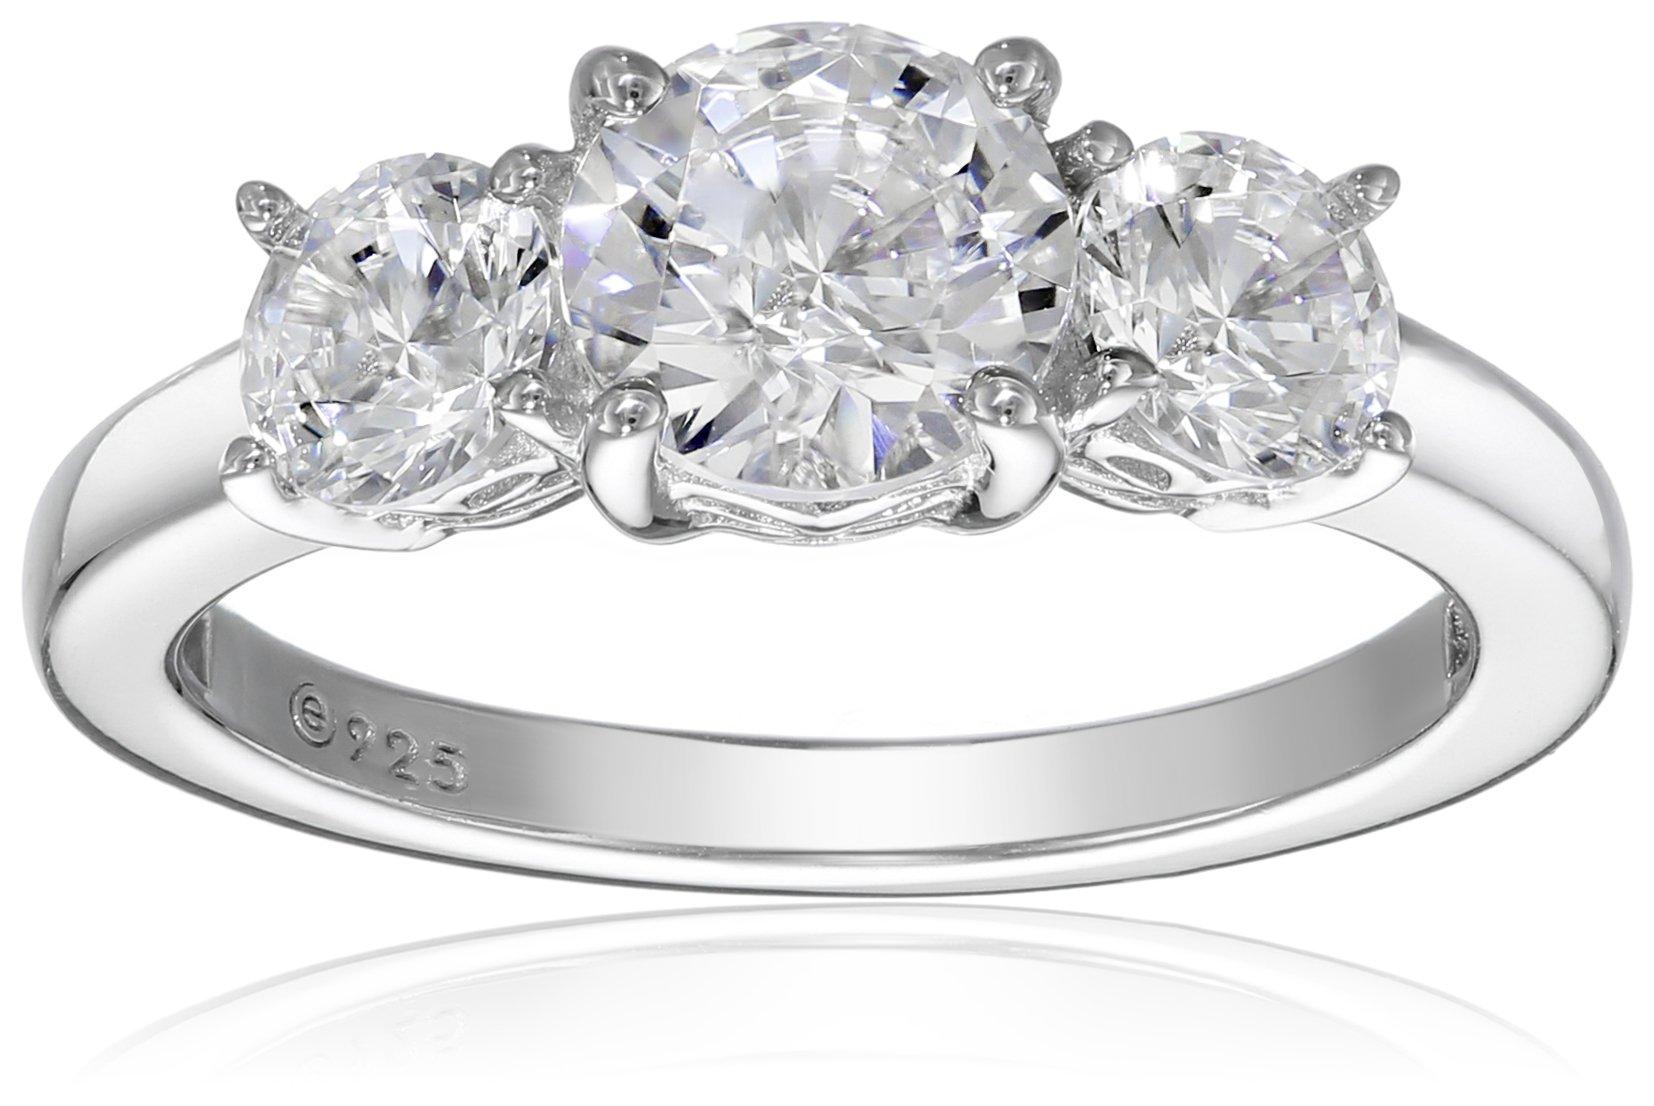 Platinum Plated Sterling Silver Three-Stone Anniversary Ring set with Round Cut Swarovski Zirconia (2 cttw), Size 6